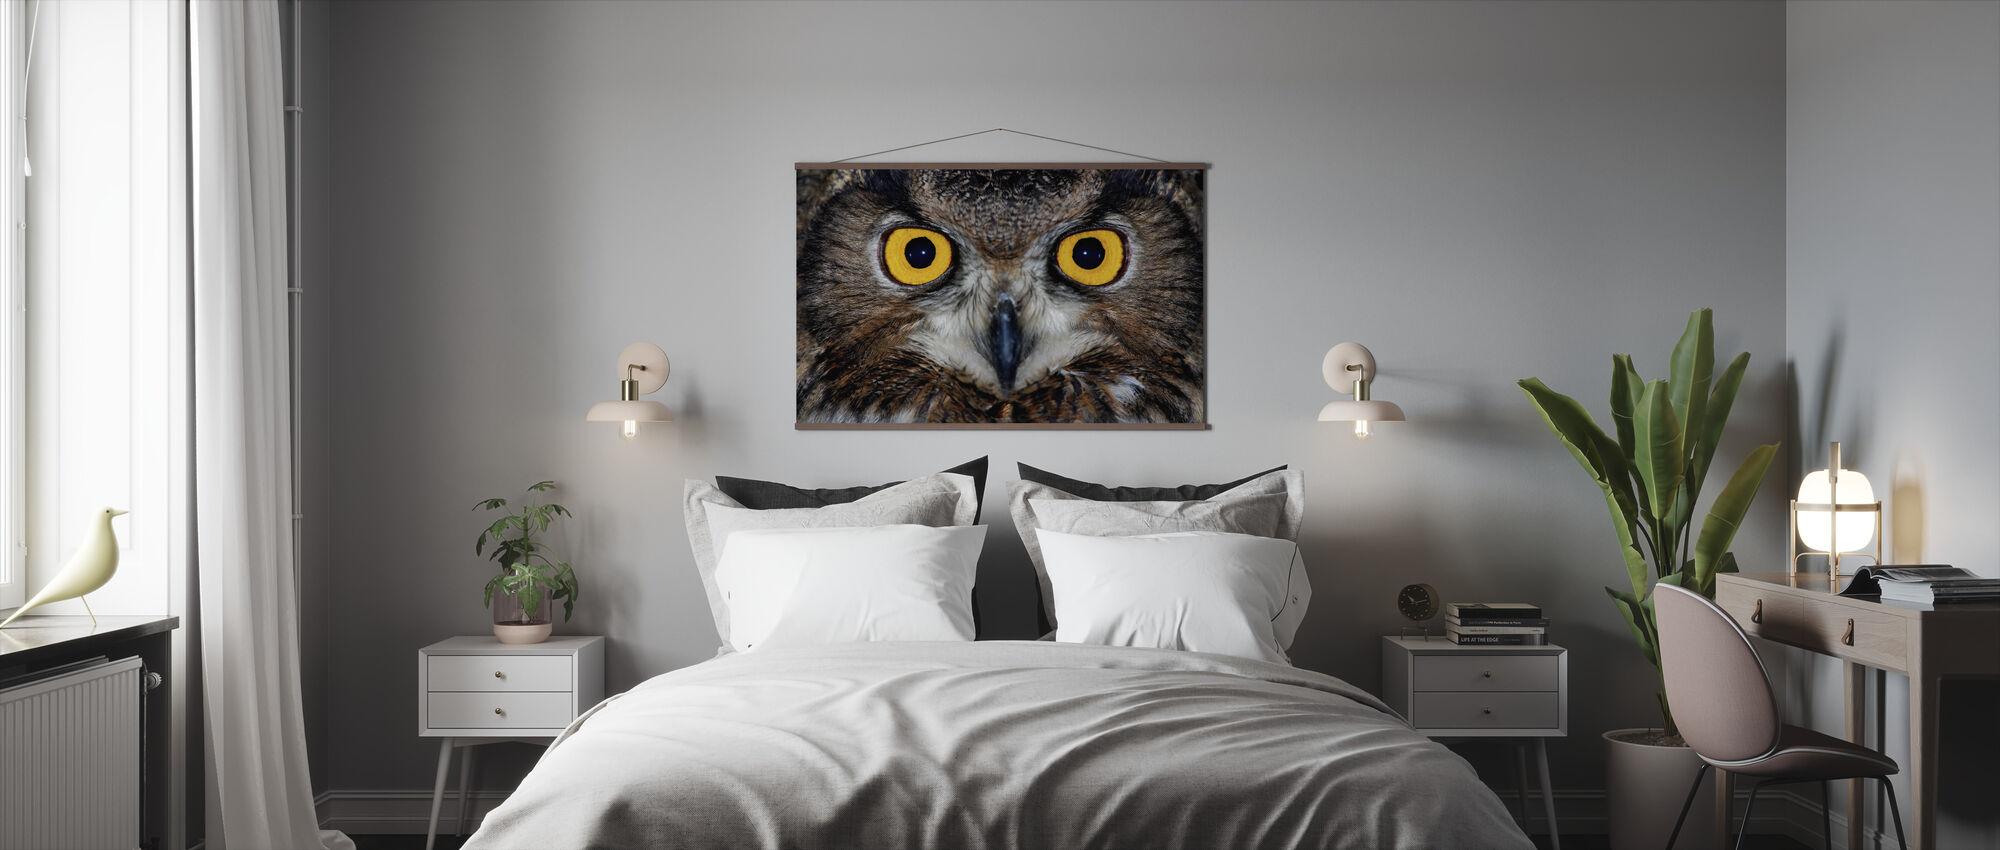 Eagle Ugle Øyne - Plakat - Soverom